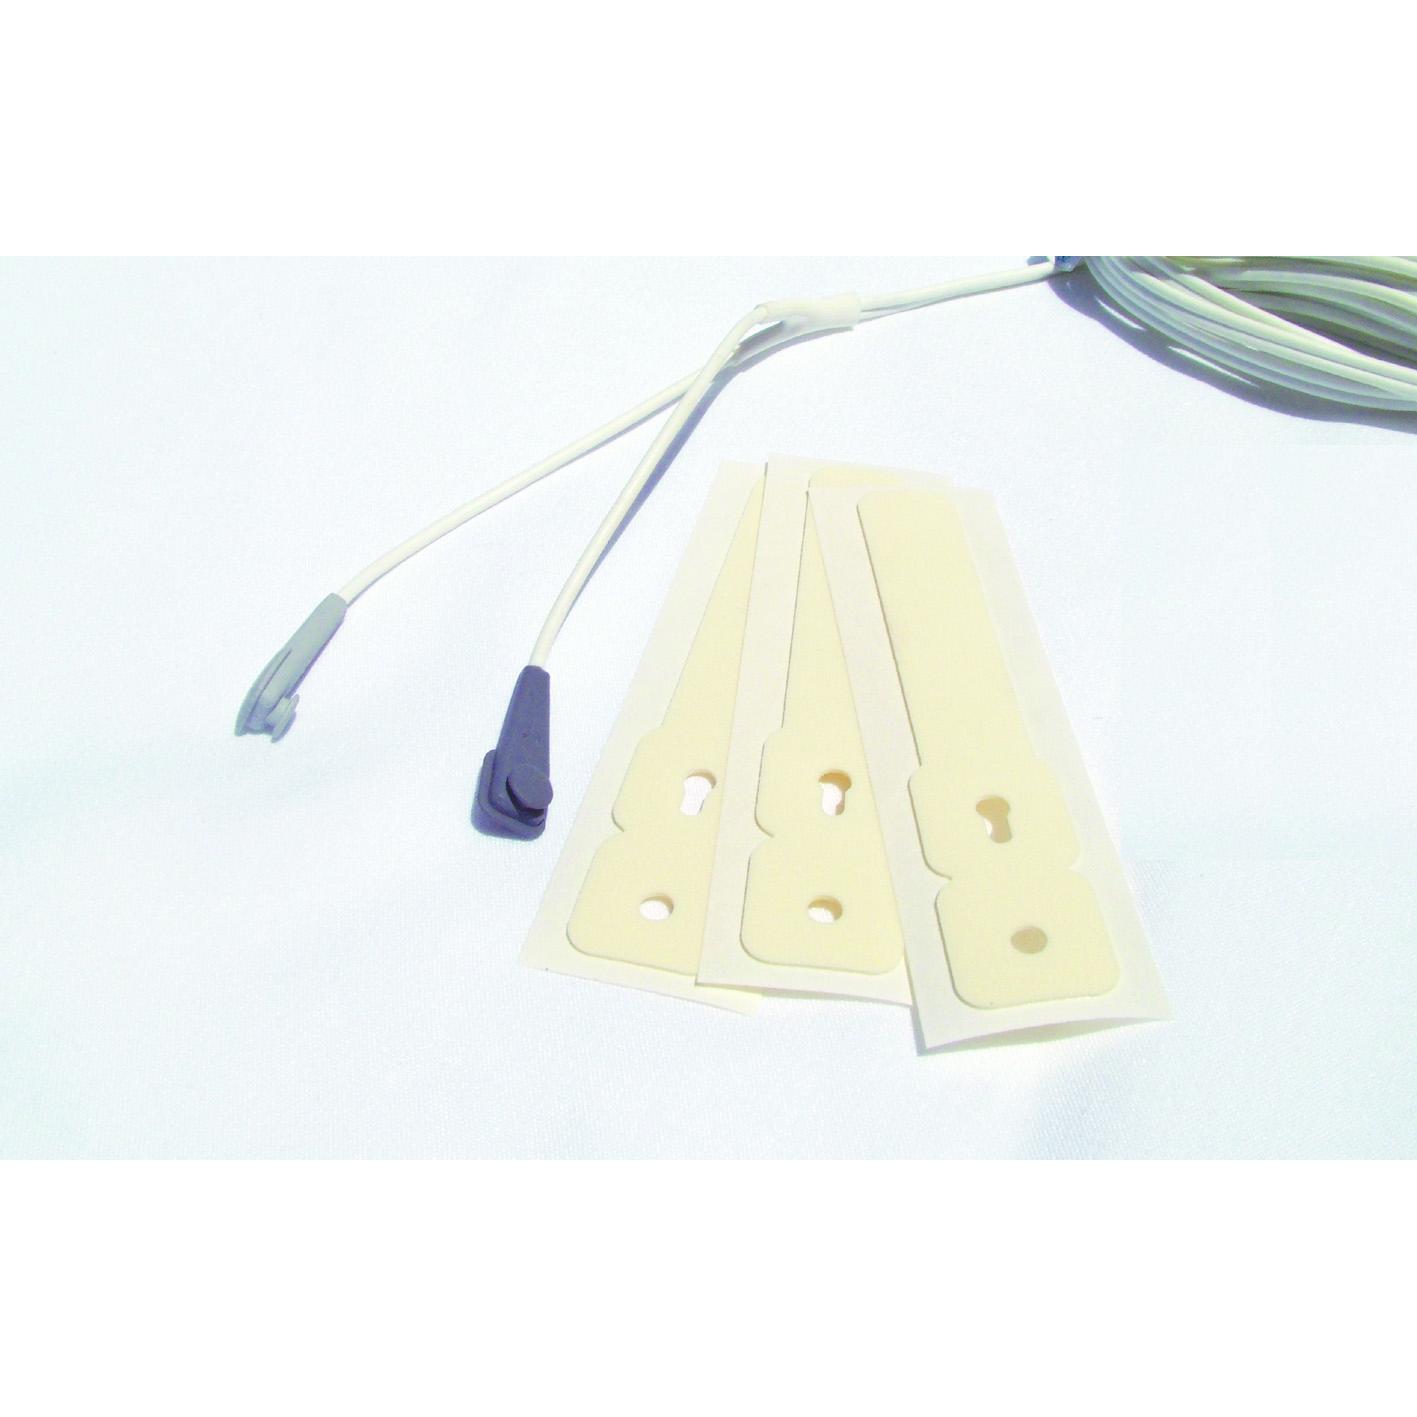 Disposable SpO2 Sensors - Ecomed